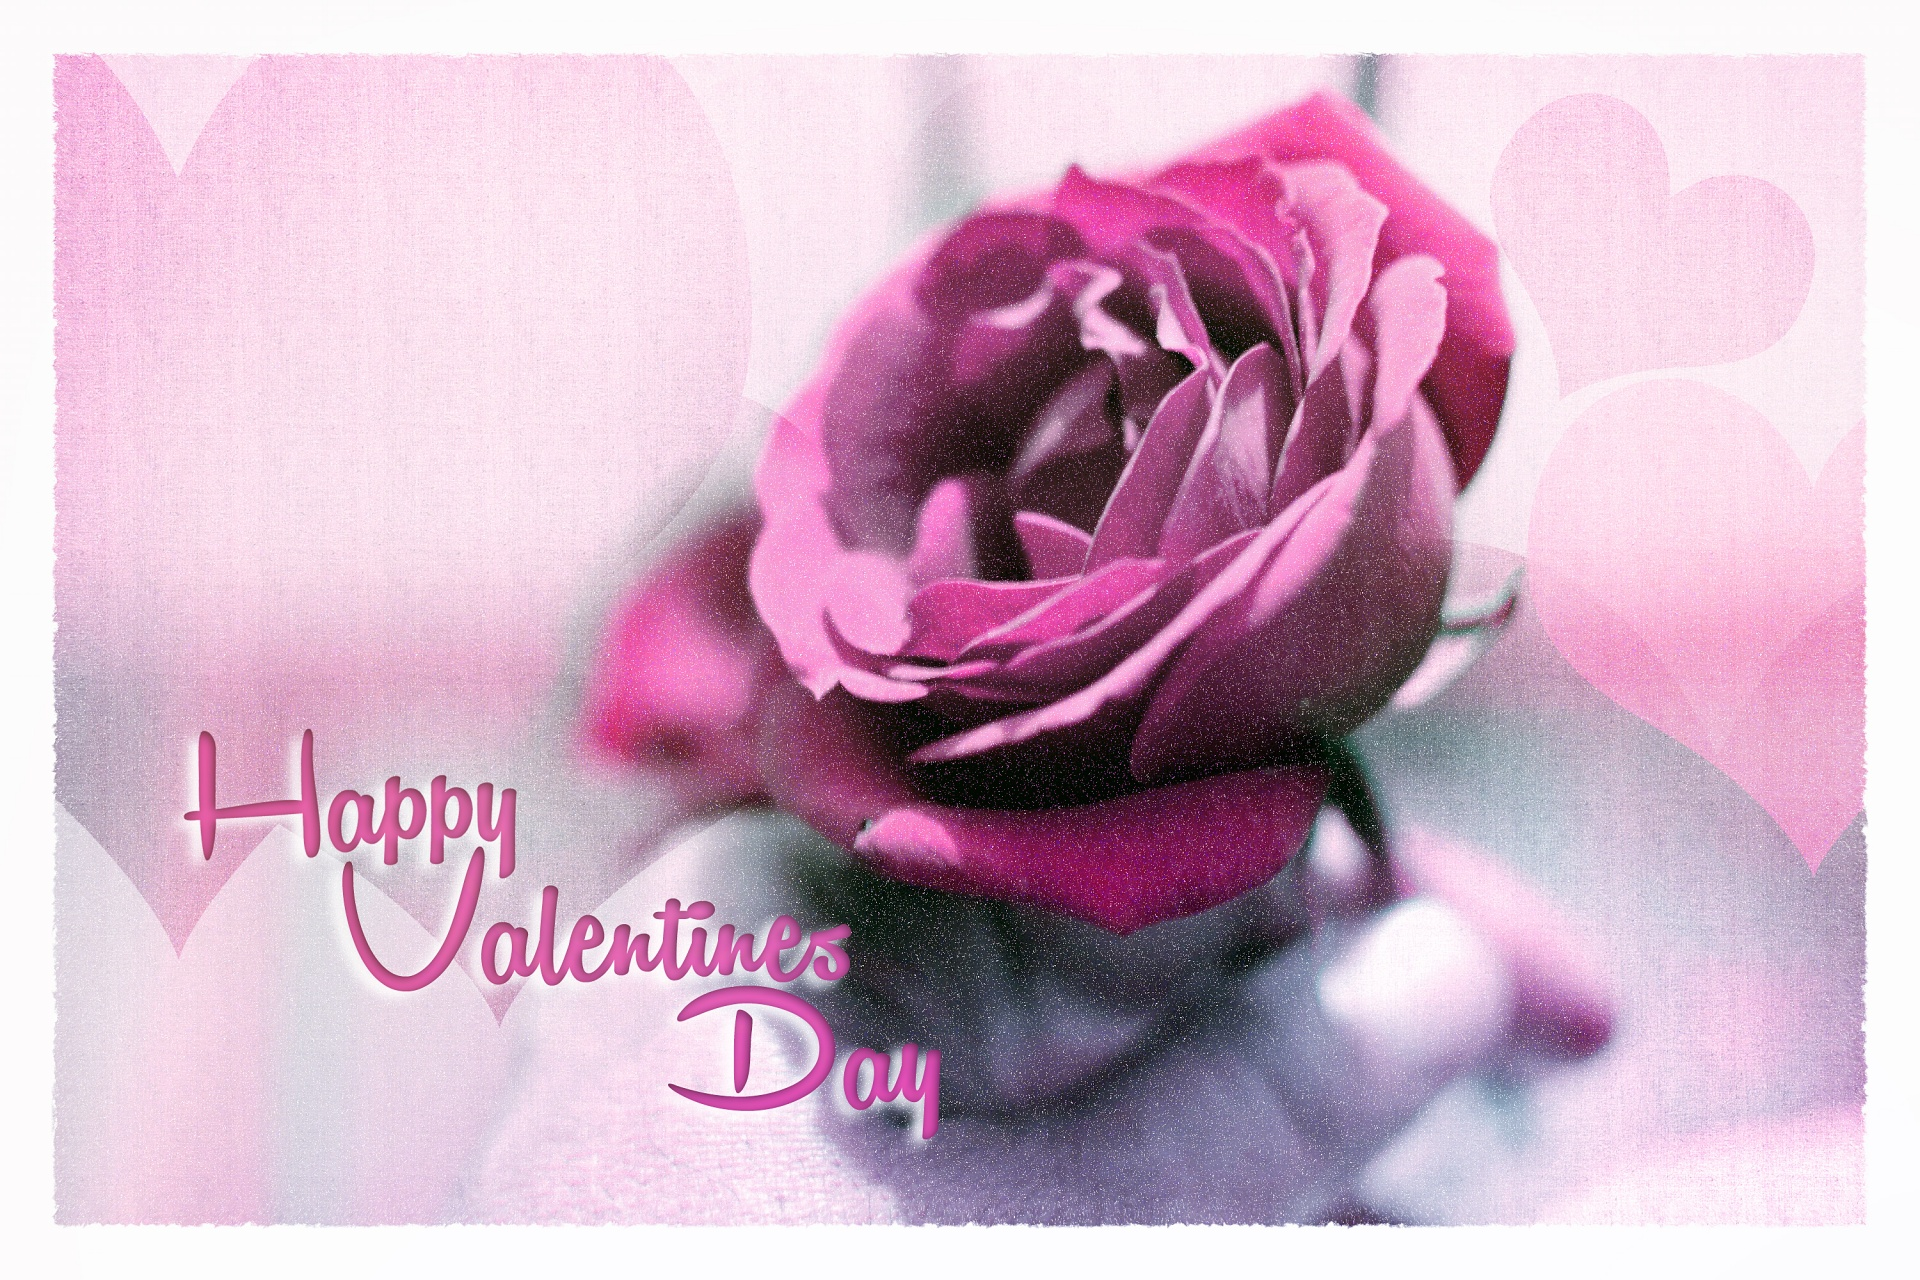 Valentinesgreetingsloveharmonycelebration Free Photo From